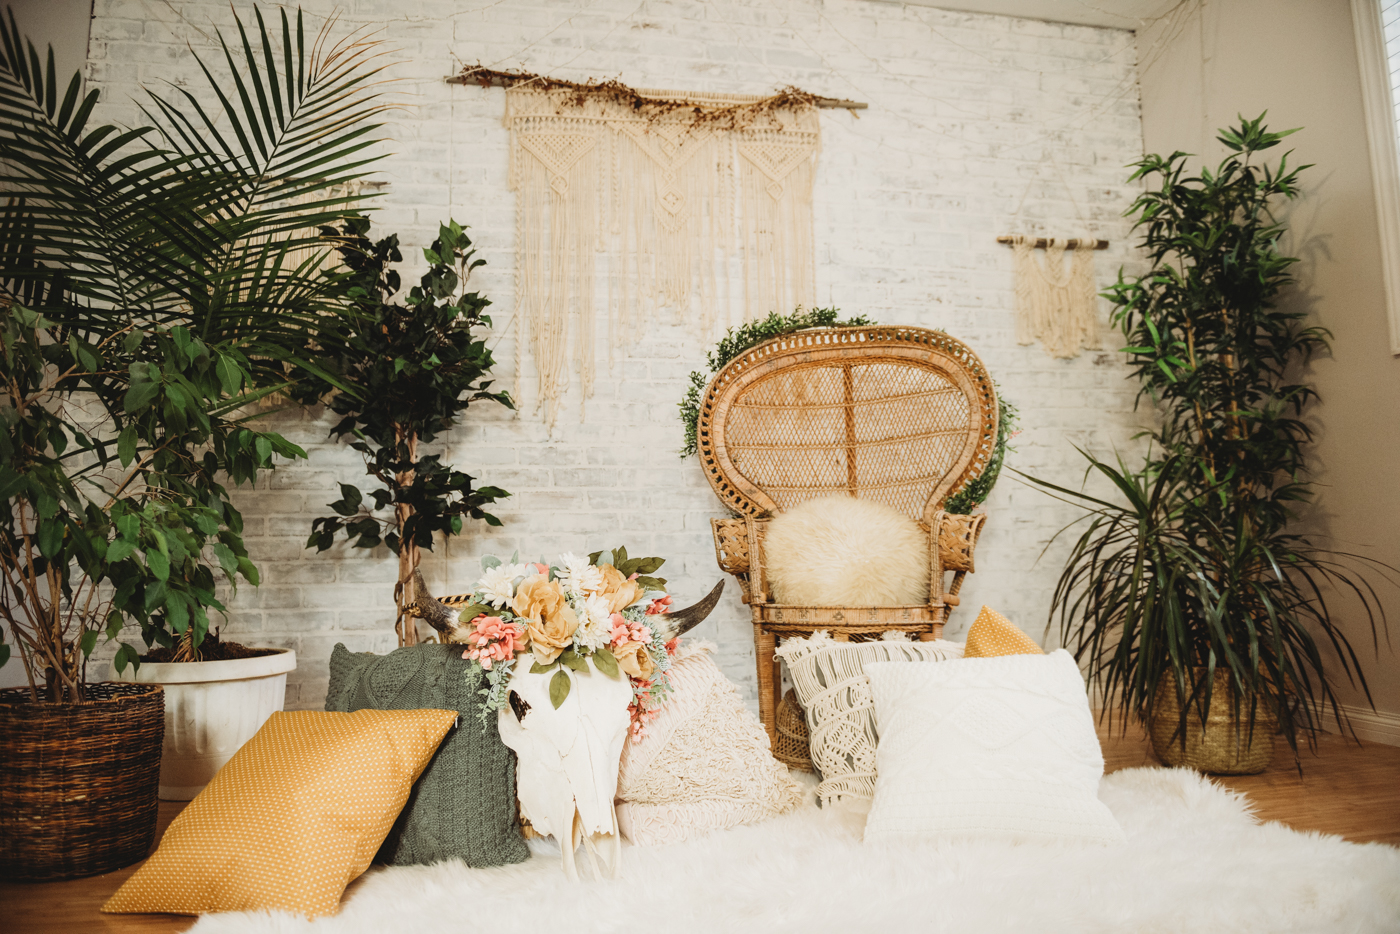 FortSt.John_photographer_TyraEPhotography_Wedding_Couple_Family_Photograhy_DawsonCreek_Elopement_Bride_Boduoir_Portraits-4667.jpg